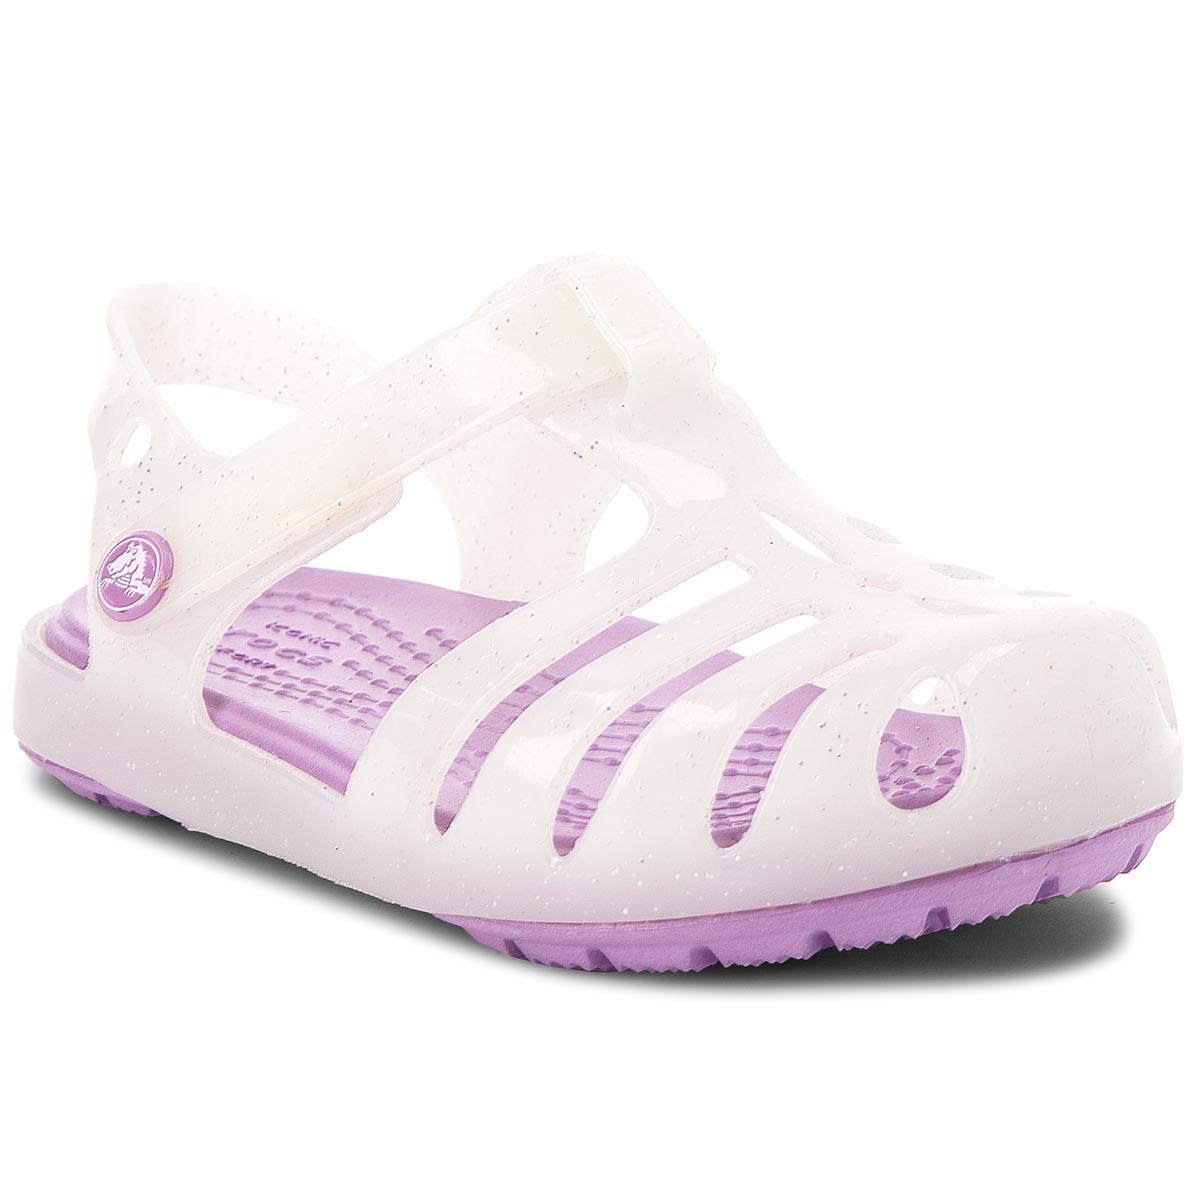 6a203361799b Sandals CROCS - Isabella Novelty Sandal 205038 Neon Purple - Sandals ...